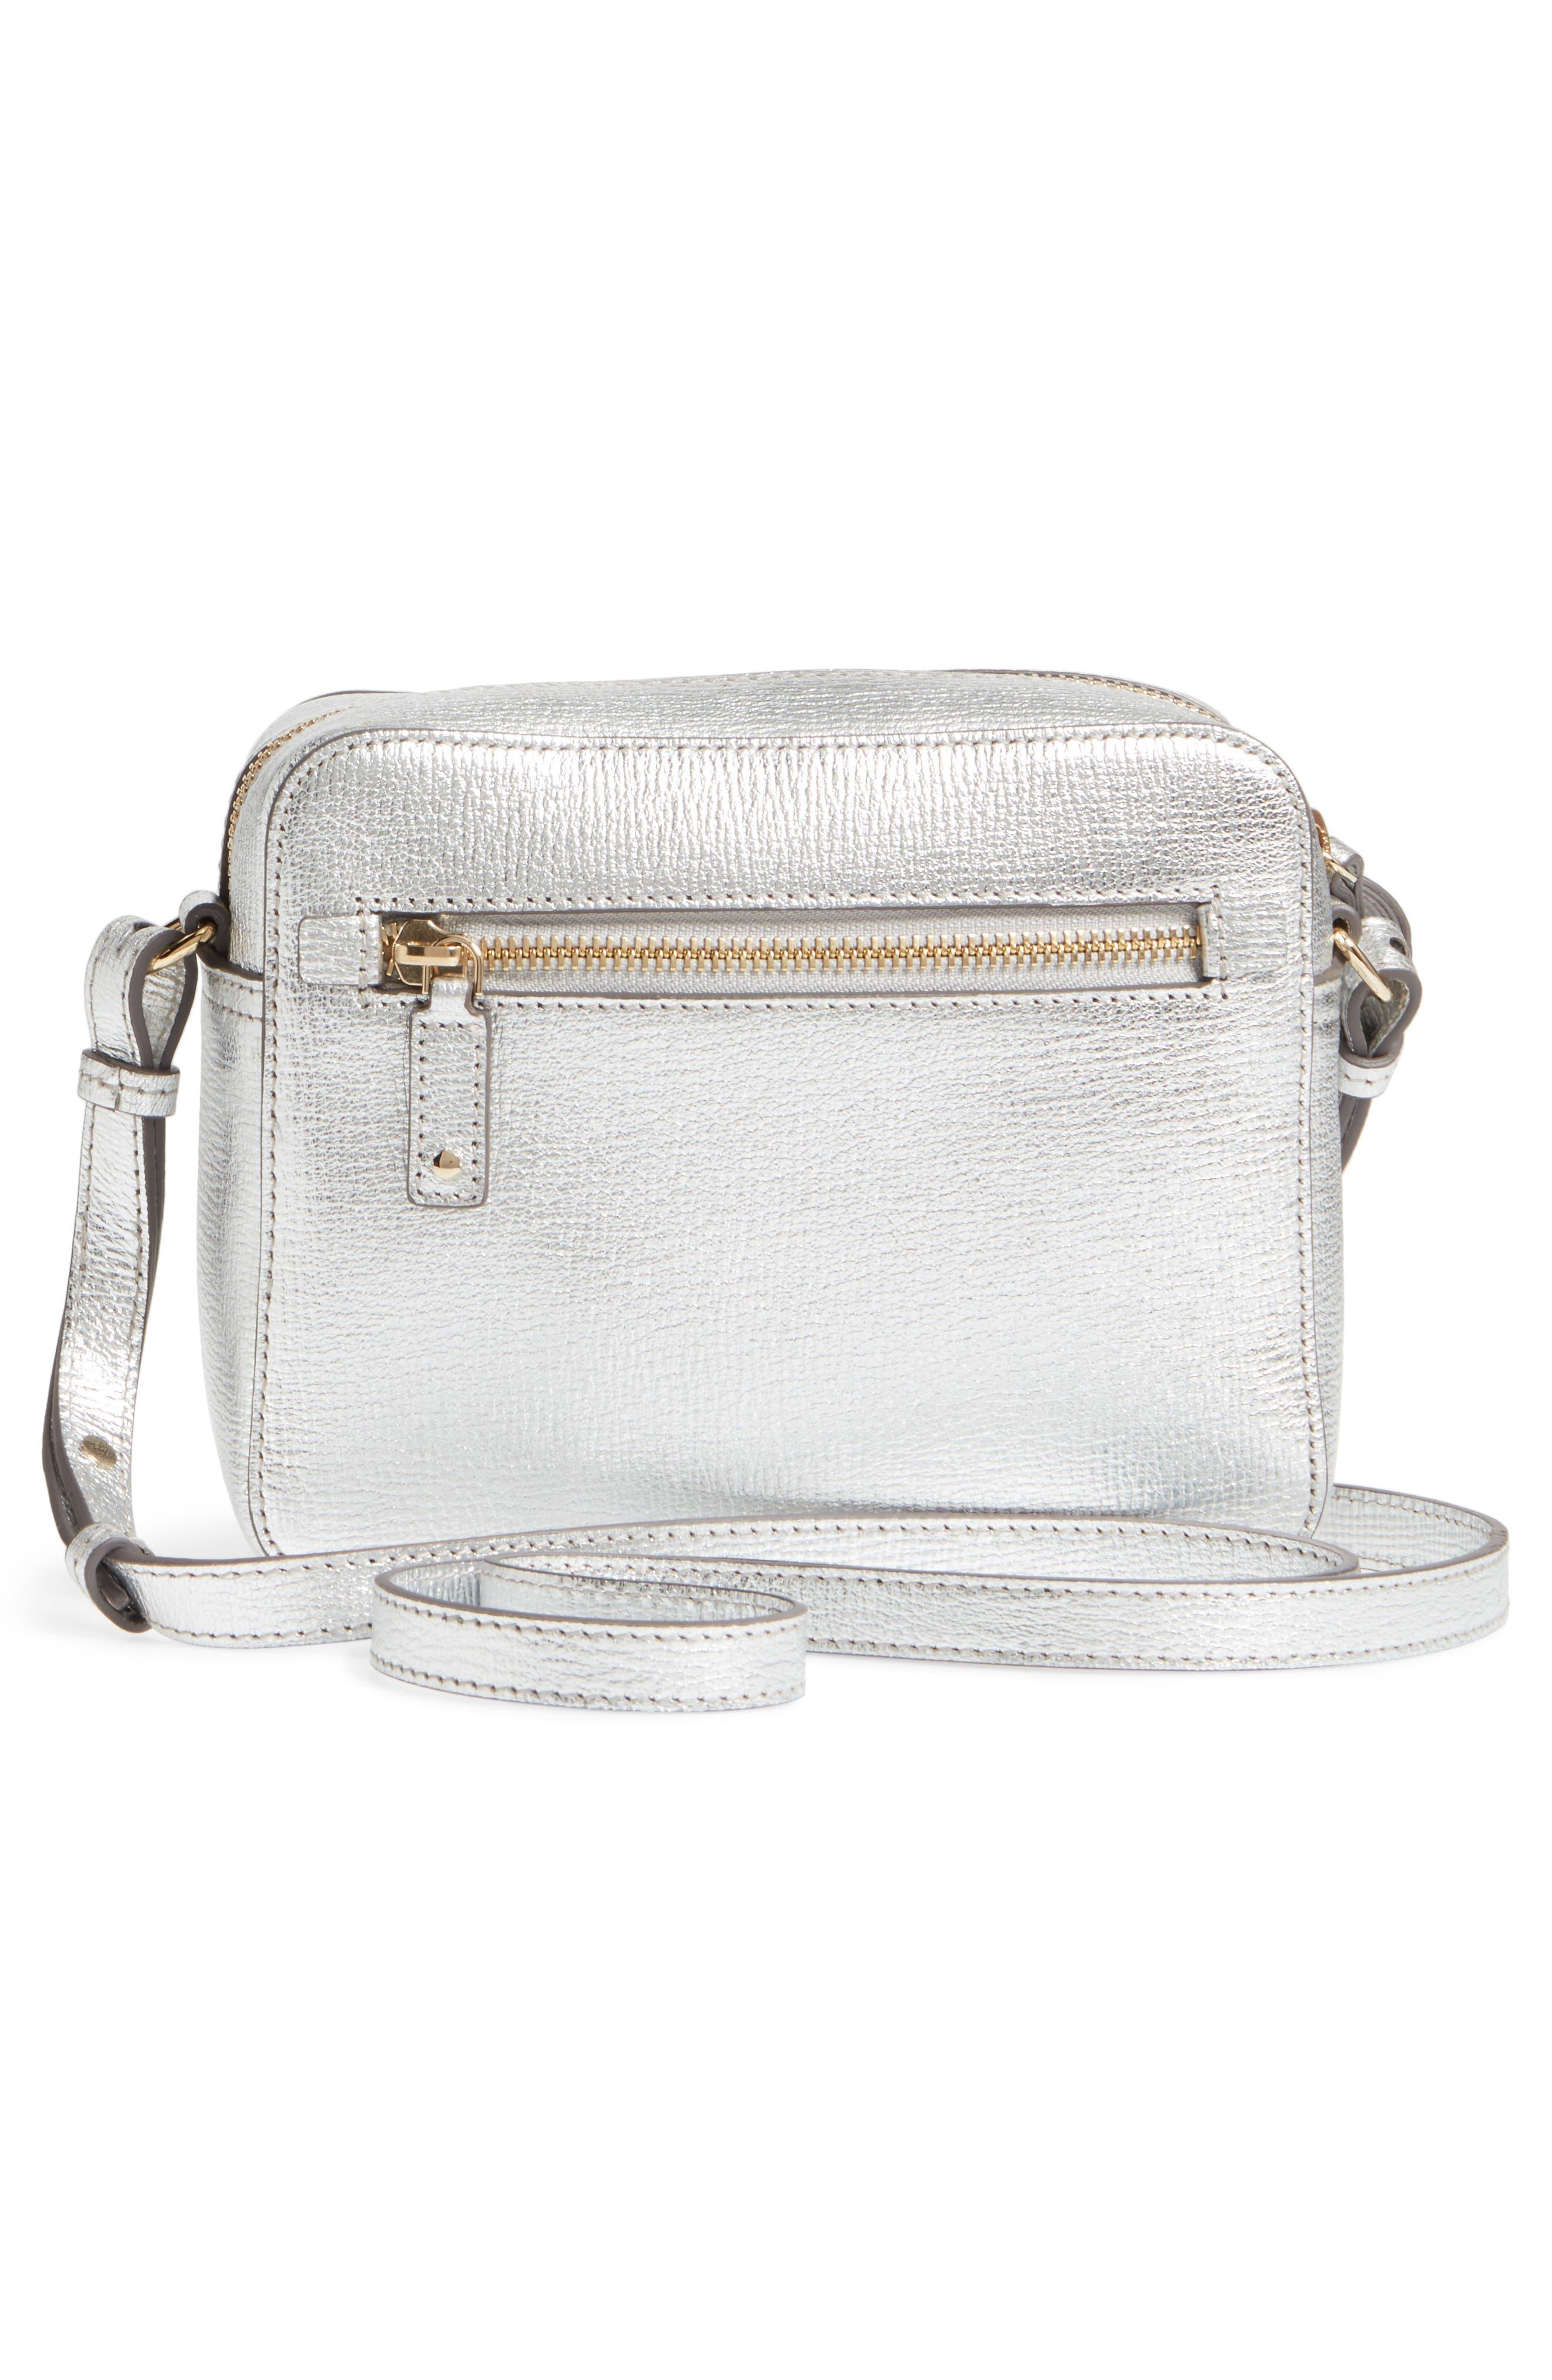 Smiley Metallic Leather Crossbody Bag,                             Alternate thumbnail 3, color,                             SILVER